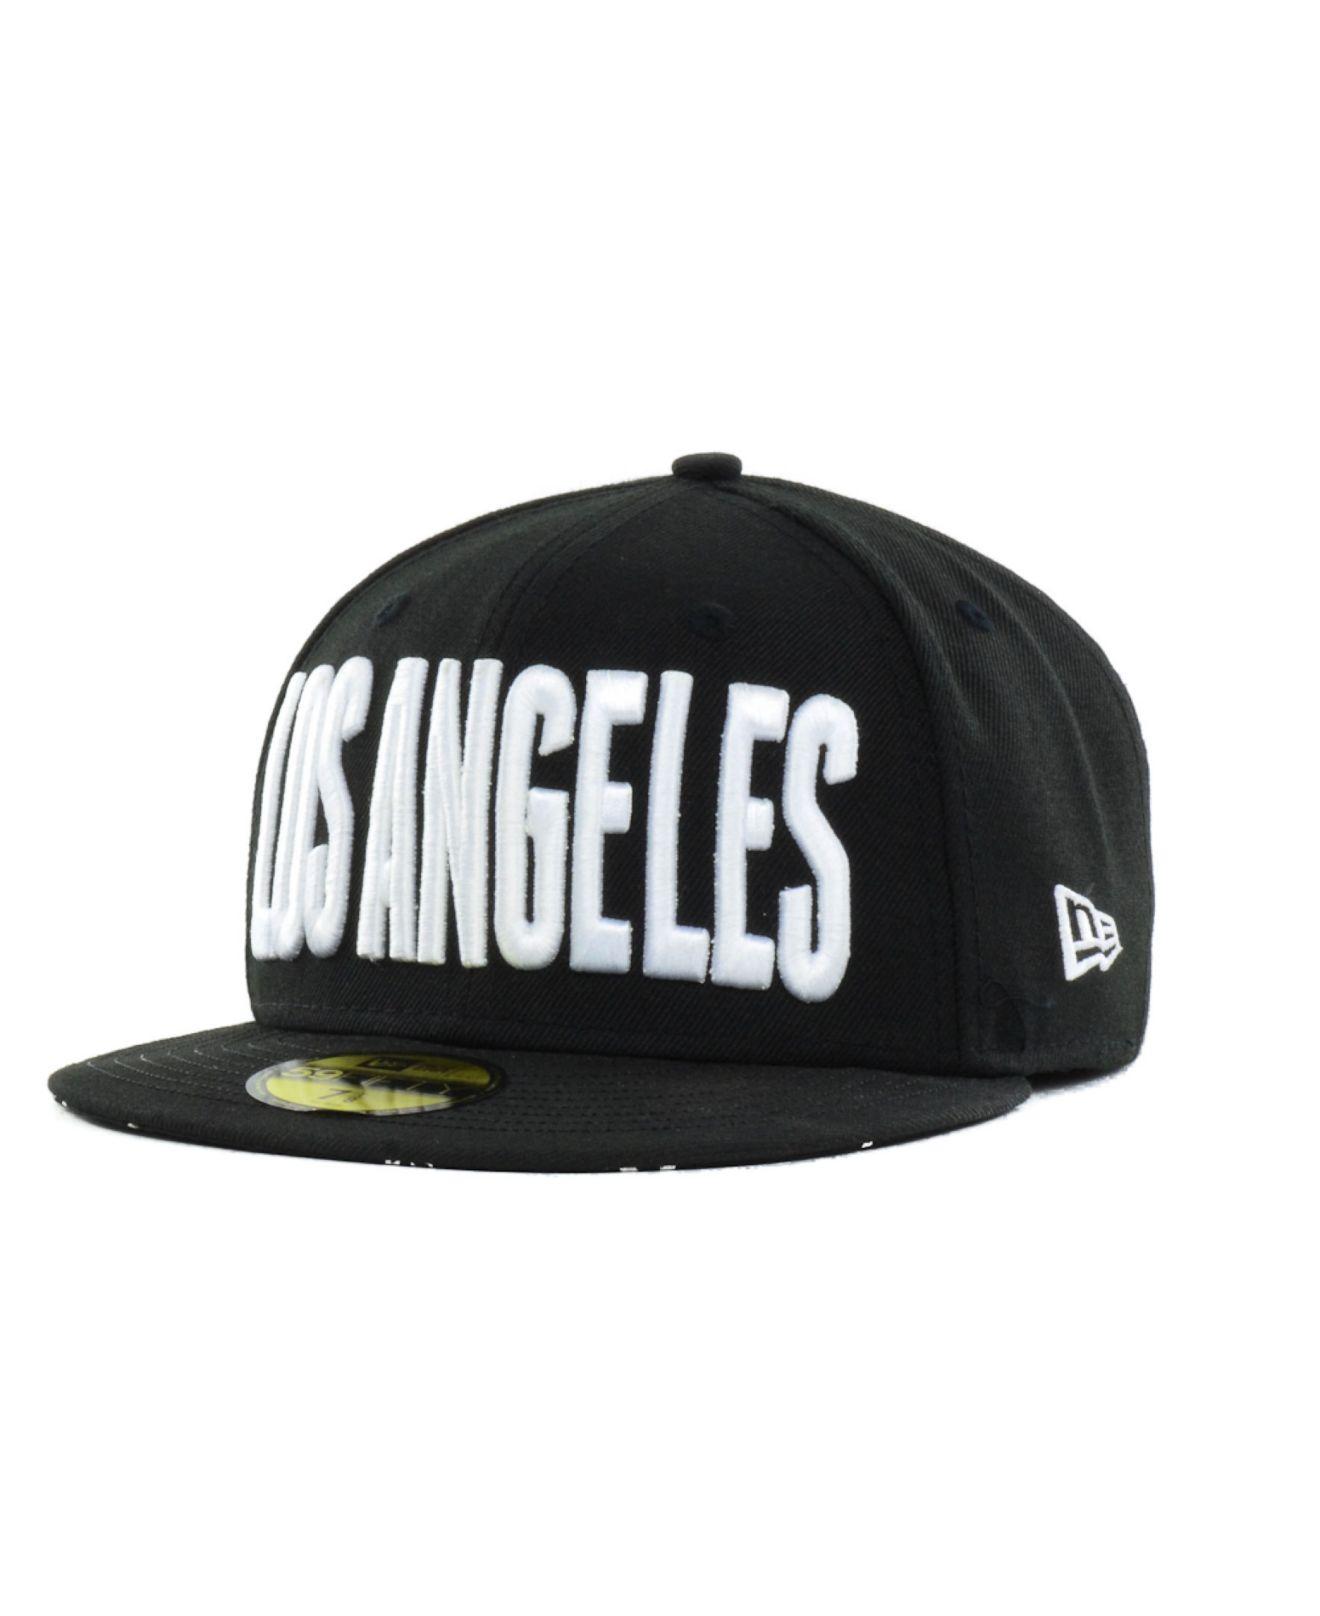 366638f9508 ireland lyst ktz los angeles dodgers big gps 59fifty cap in black for men  98a02 97bf2